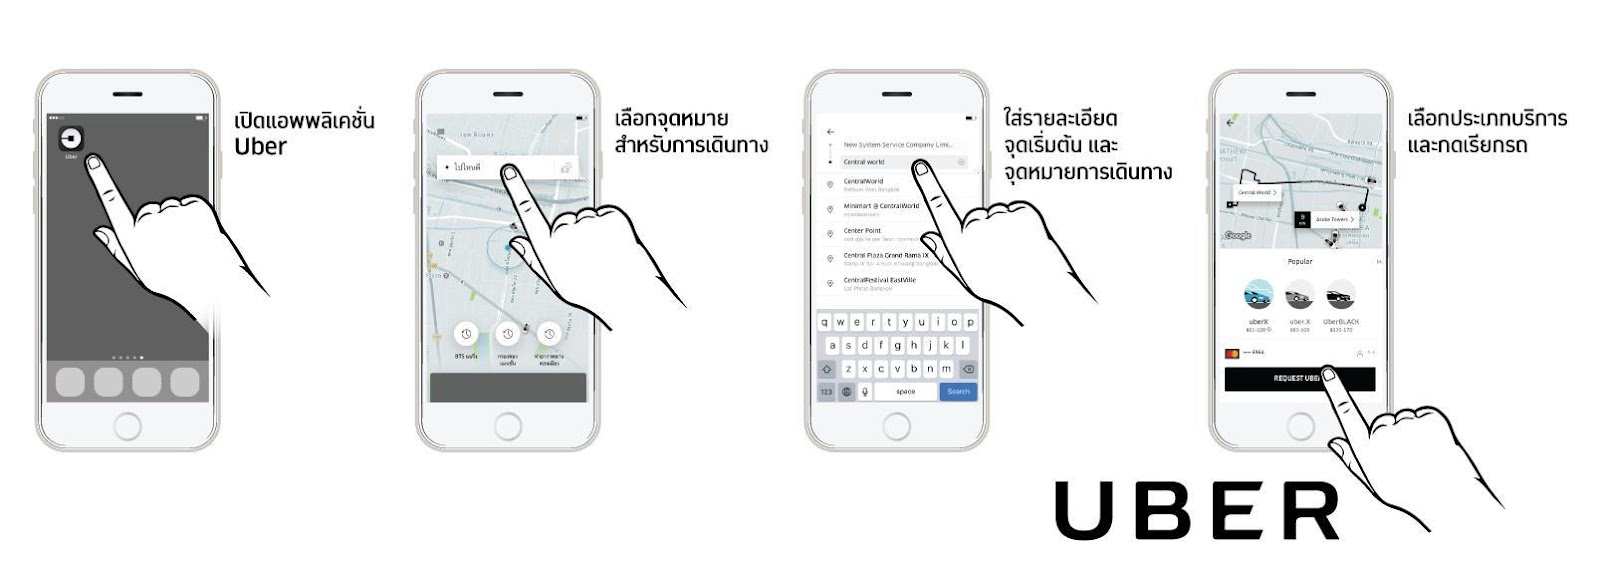 Pan _How to ride Uber.jpg